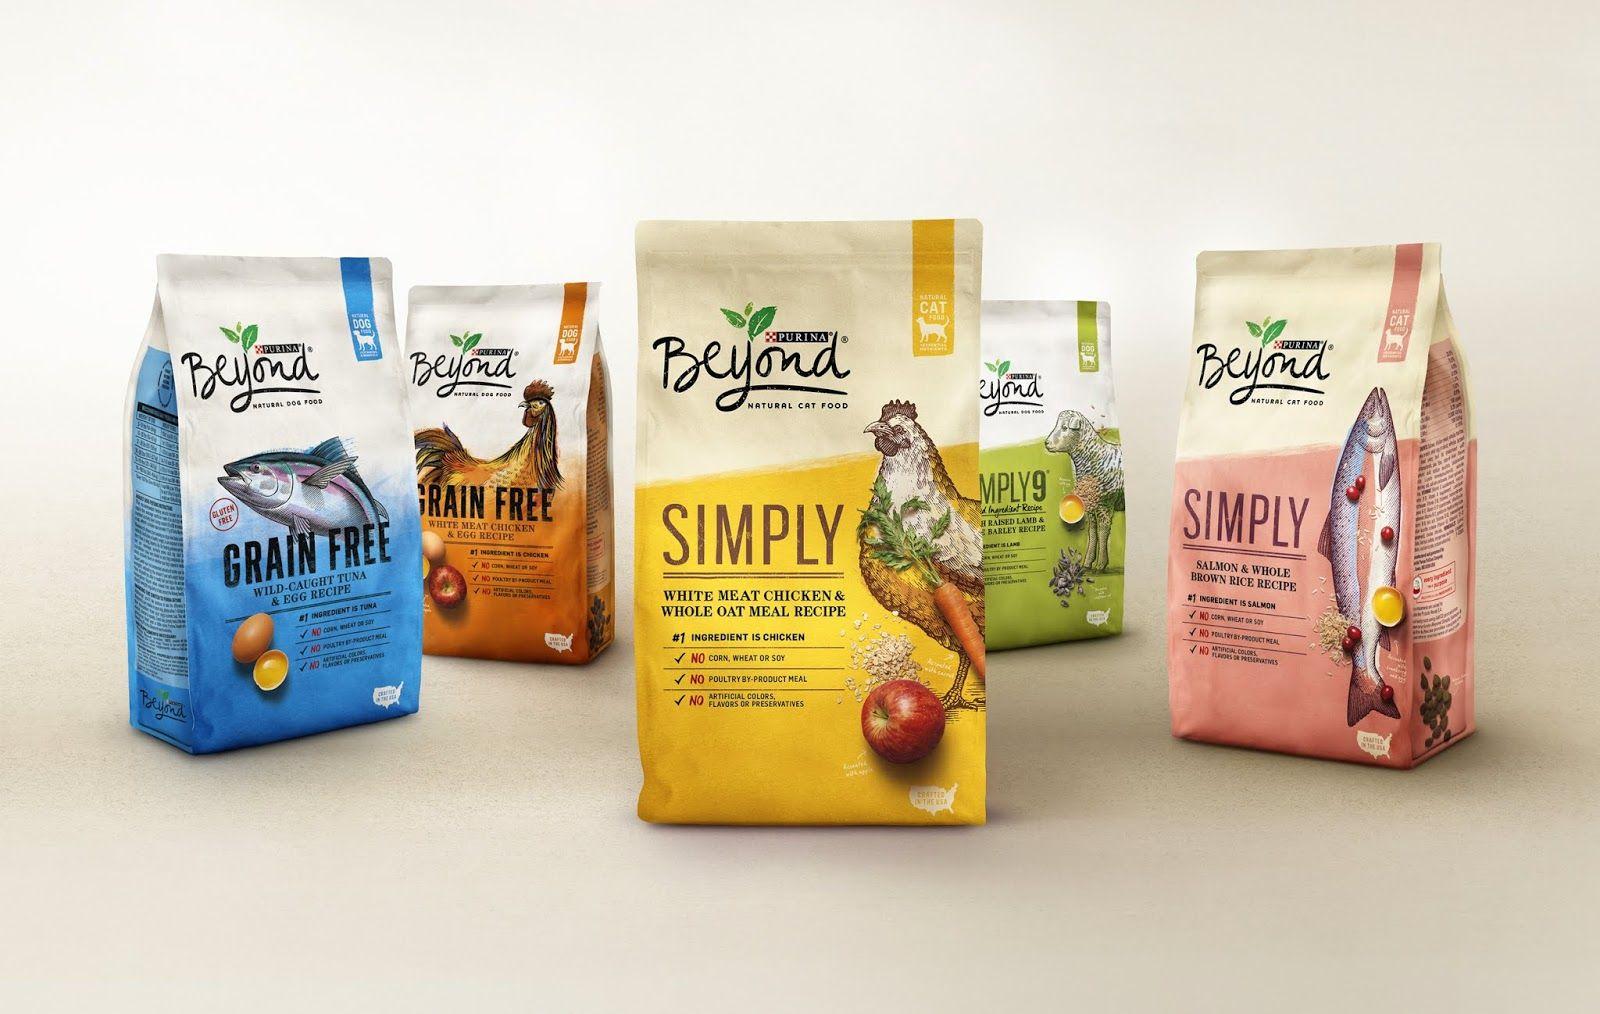 Purina beyond natural pet food pet food packaging